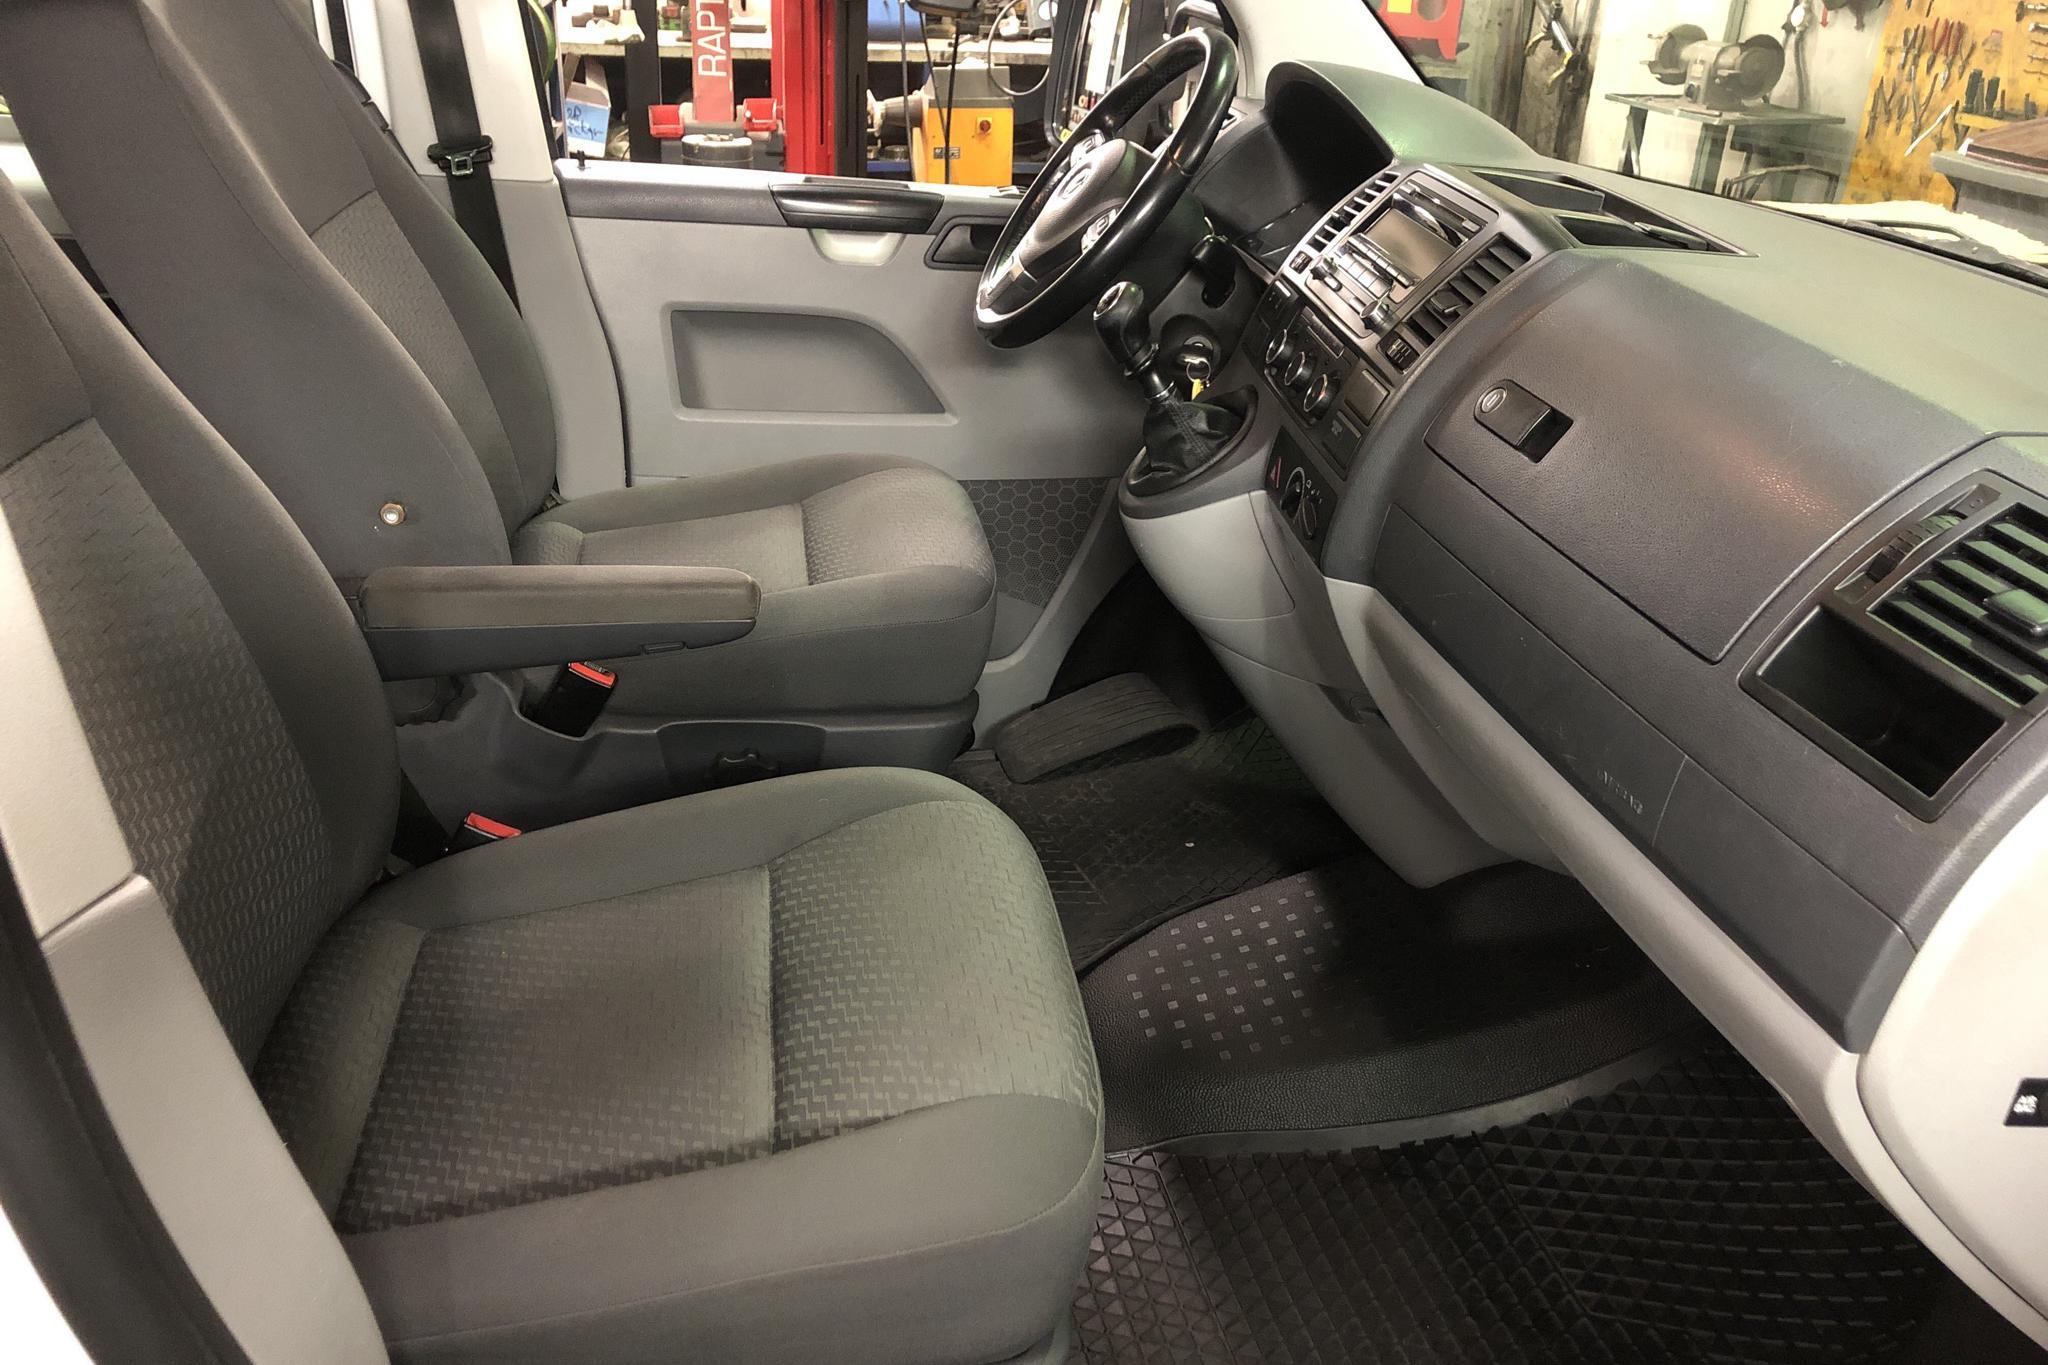 VW Transporter T5 2.0 TDI Pickup 4MOTION (140hk) - 163 340 km - Manual - white - 2011